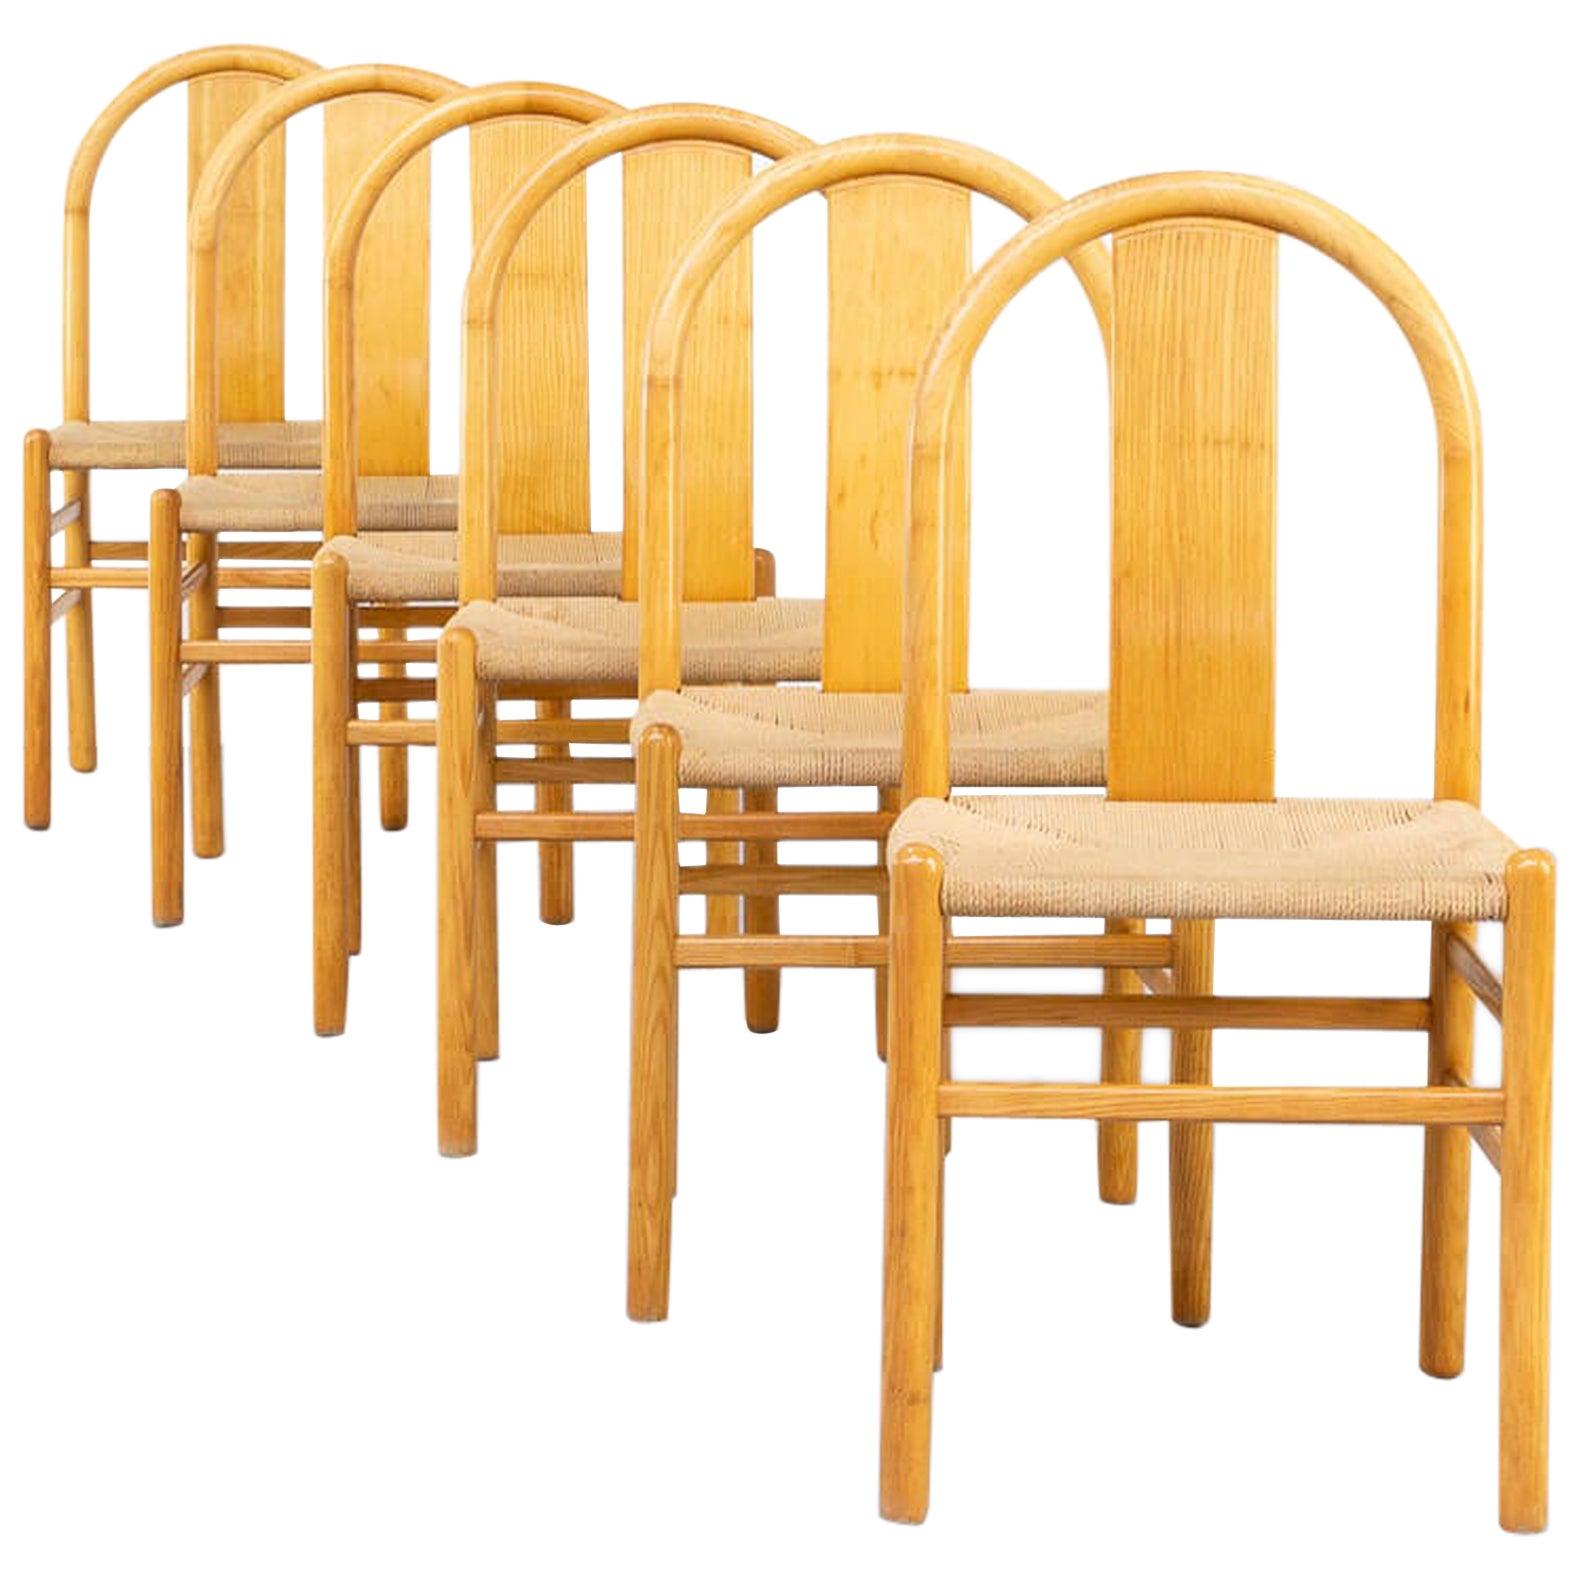 80s Annig Sarian Round Bend Wooden Dining Chair for Tisettanta Set/6